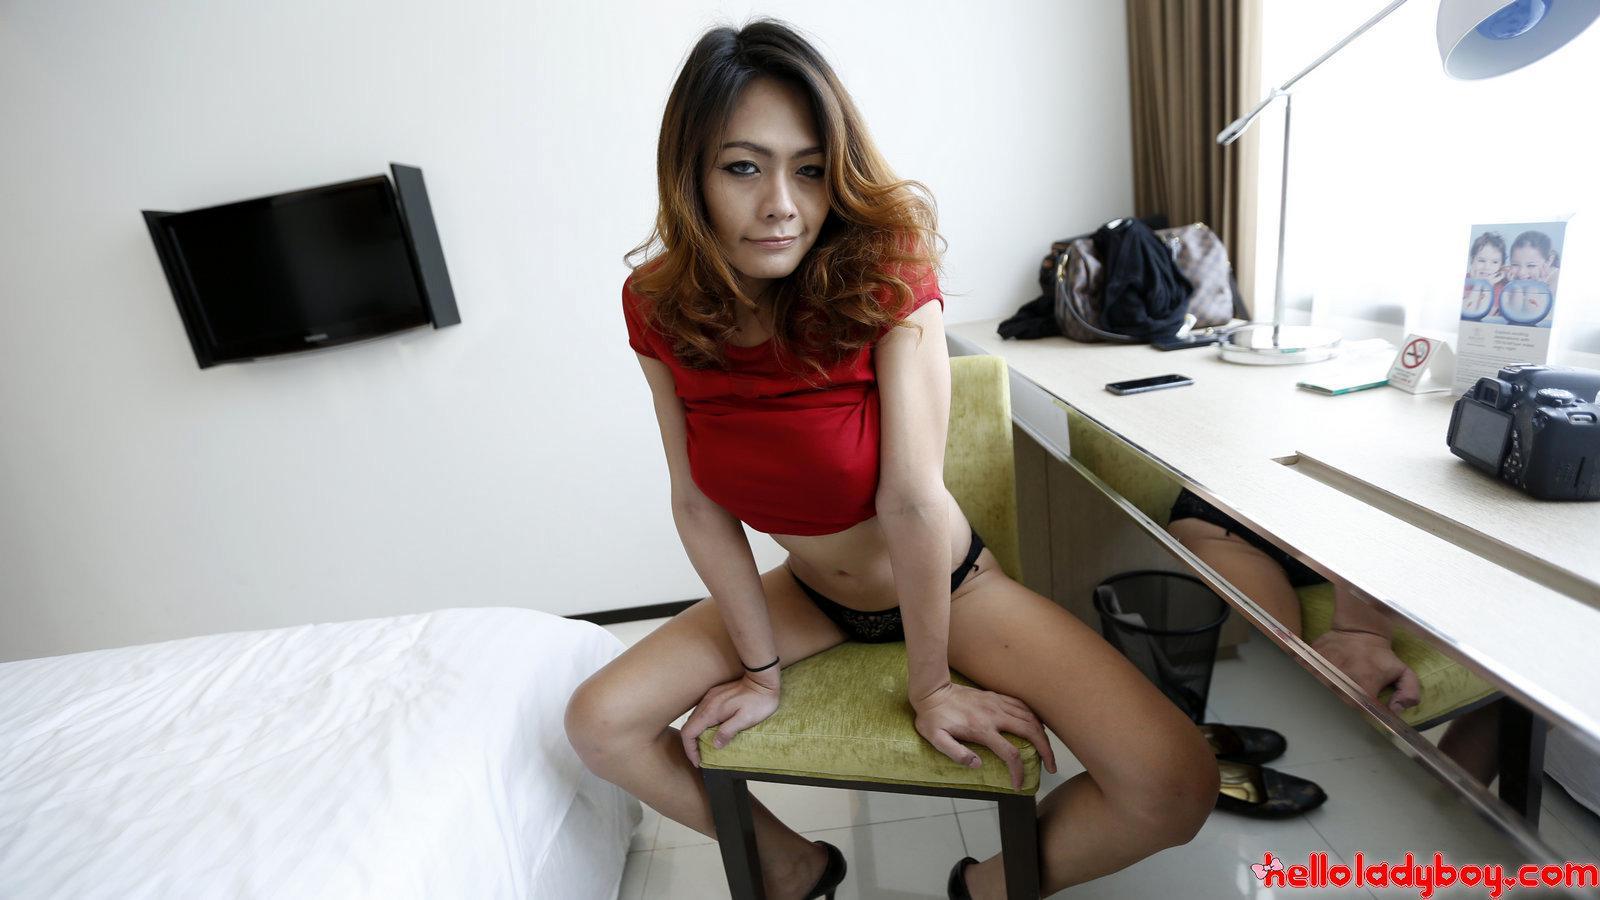 Depraved Asian T-Girl Whore Getting Her Butt Stuffed